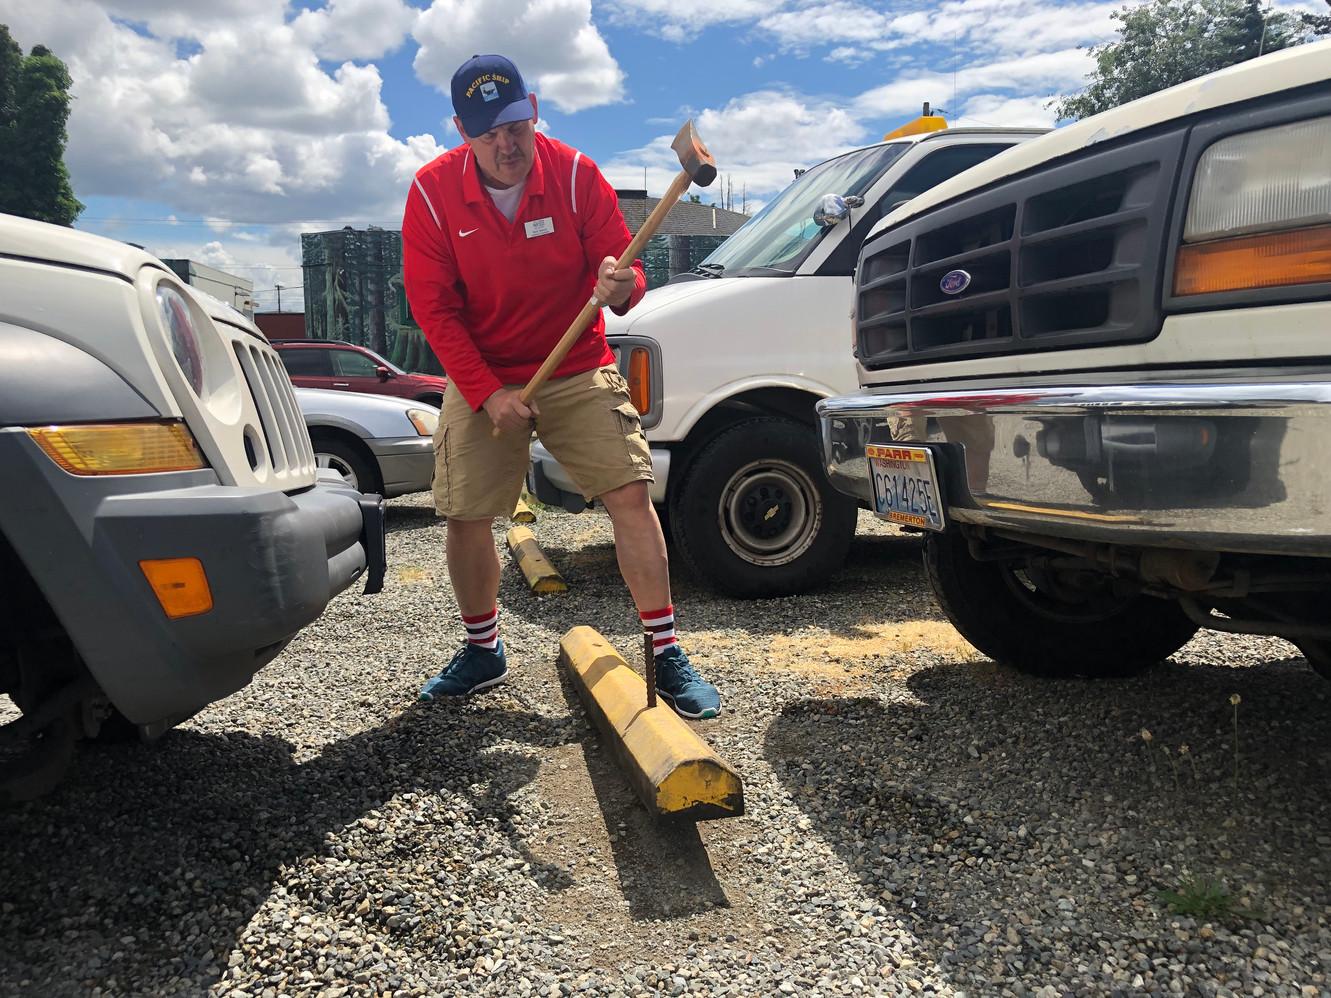 Volunteer Janitor/Maintenance